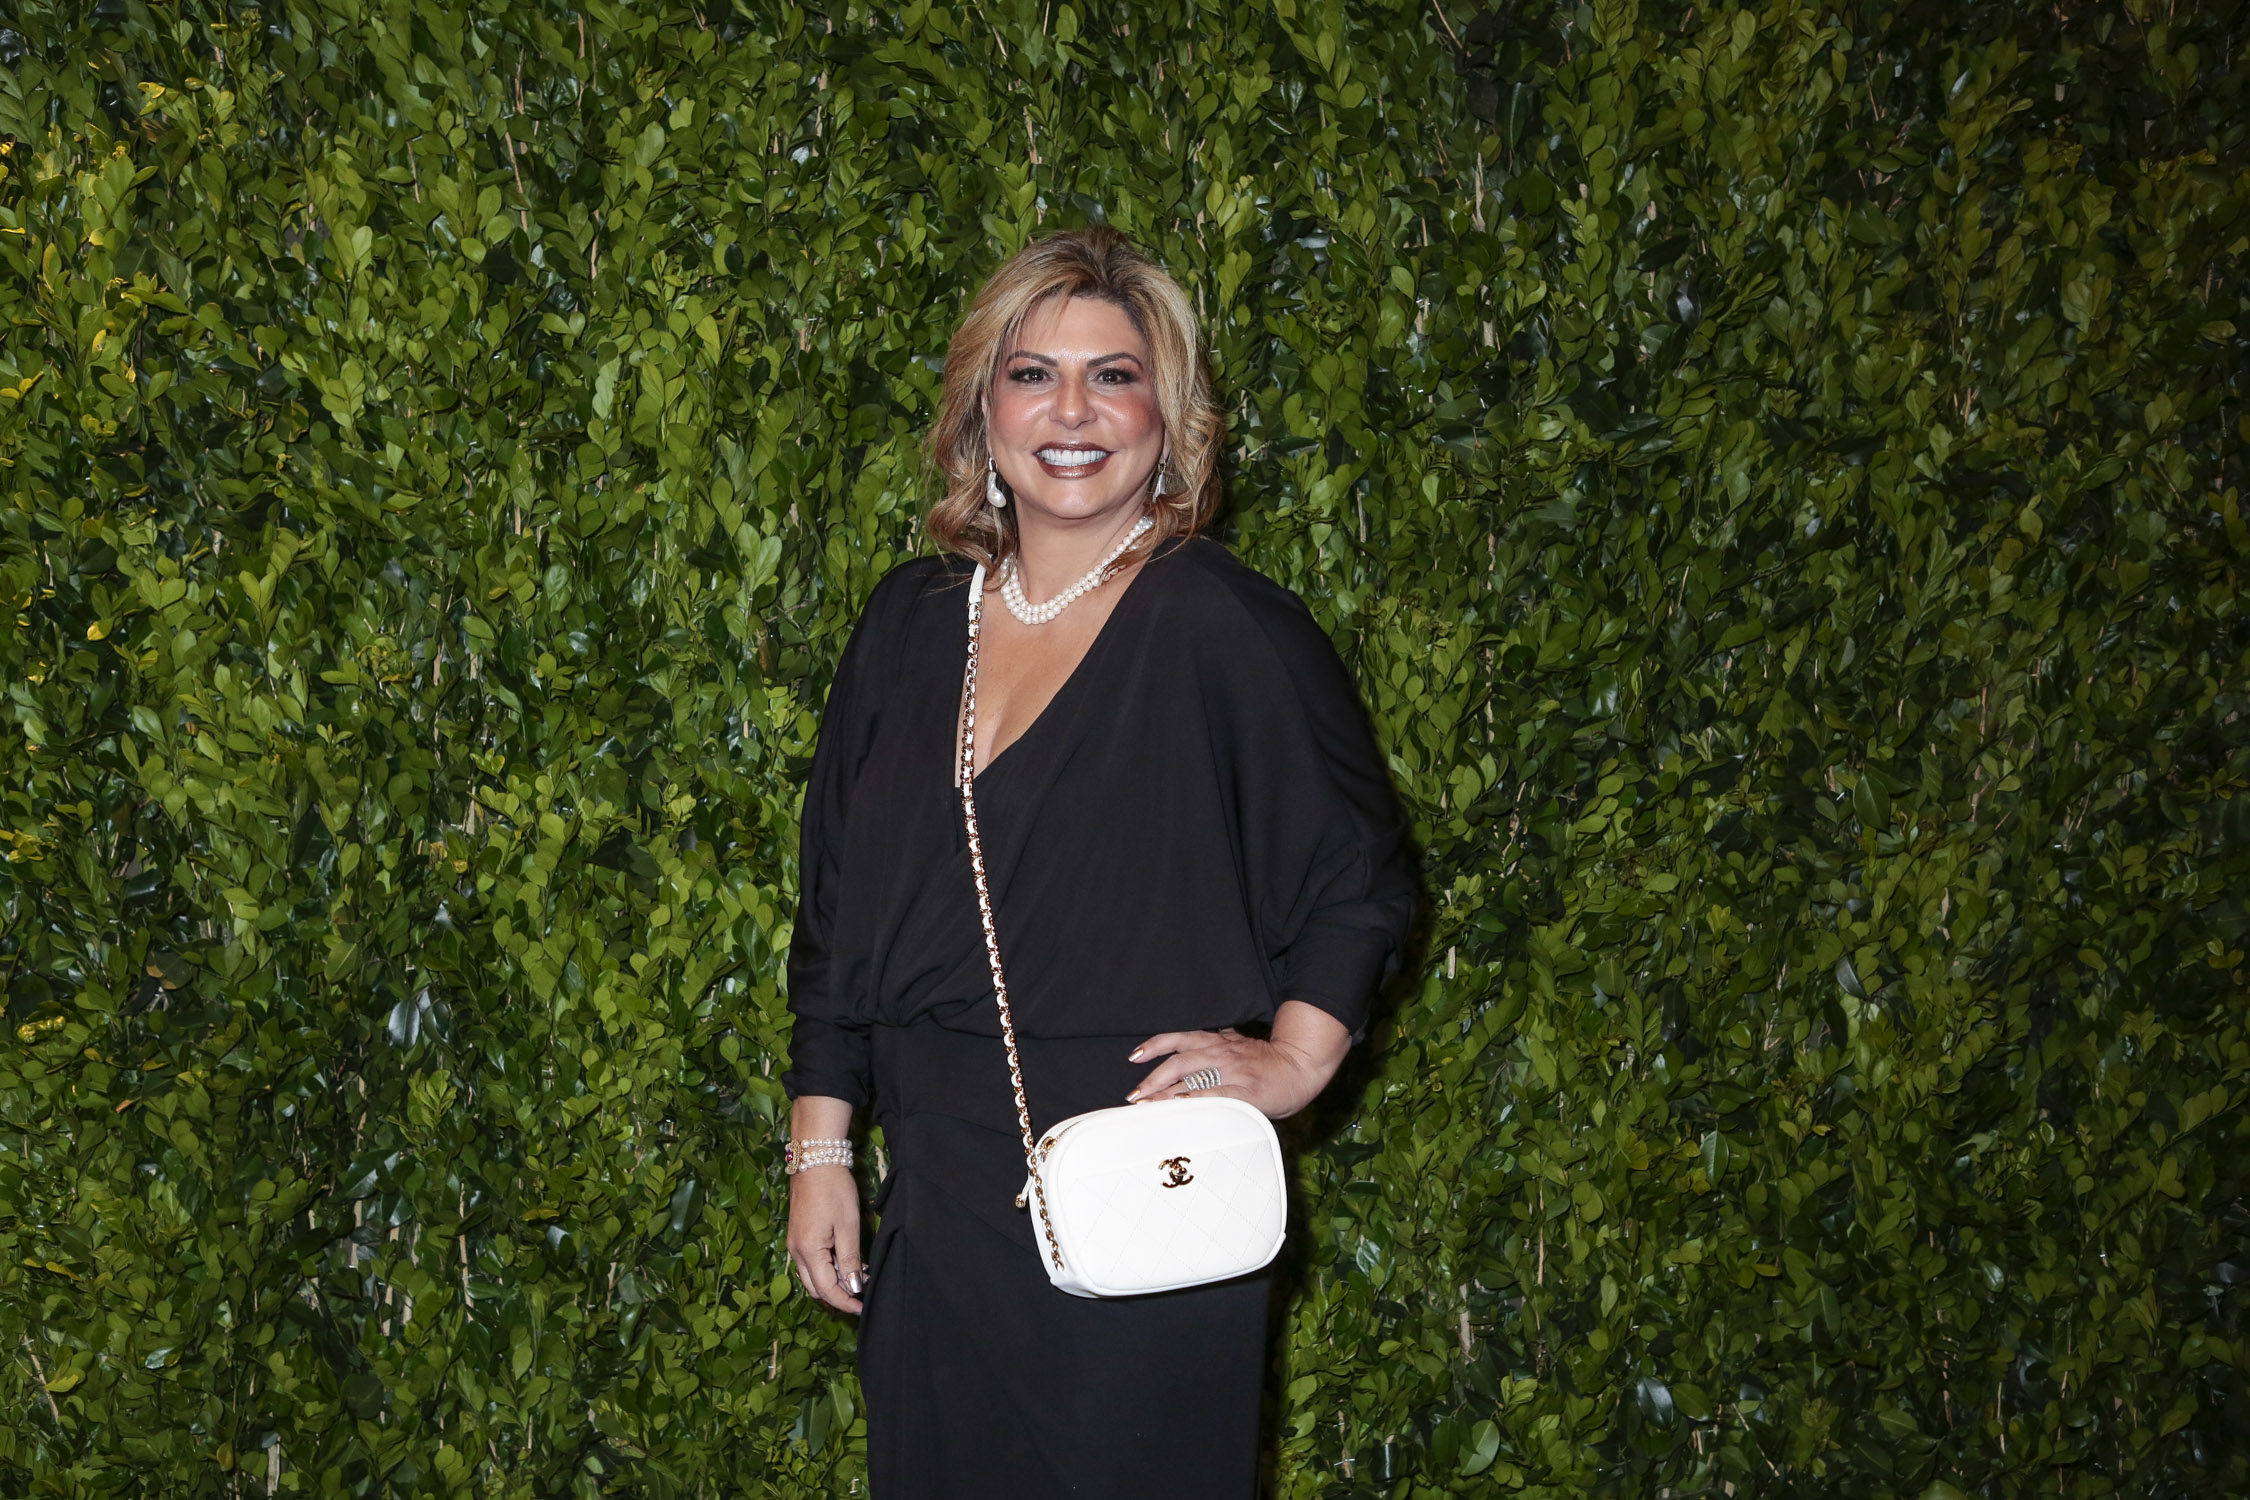 Carol Maluf V BrazilFoundation Gala São Paulo Chanel 2018 Filantropia Brasil Philanthropy Brazil